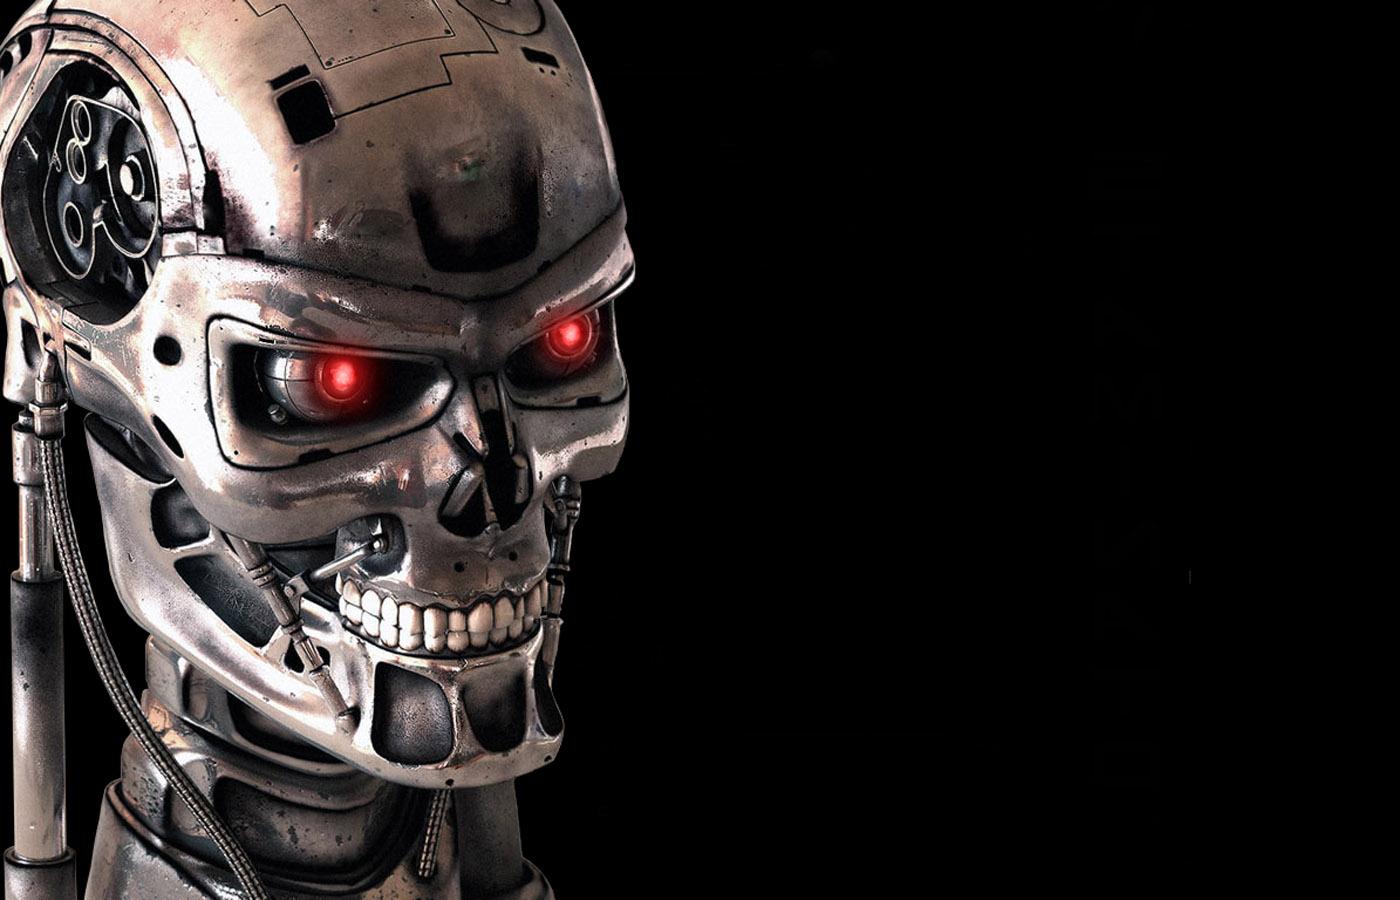 High Resolution Wallpaper | Terminator 5 Infinity 1400x900 px